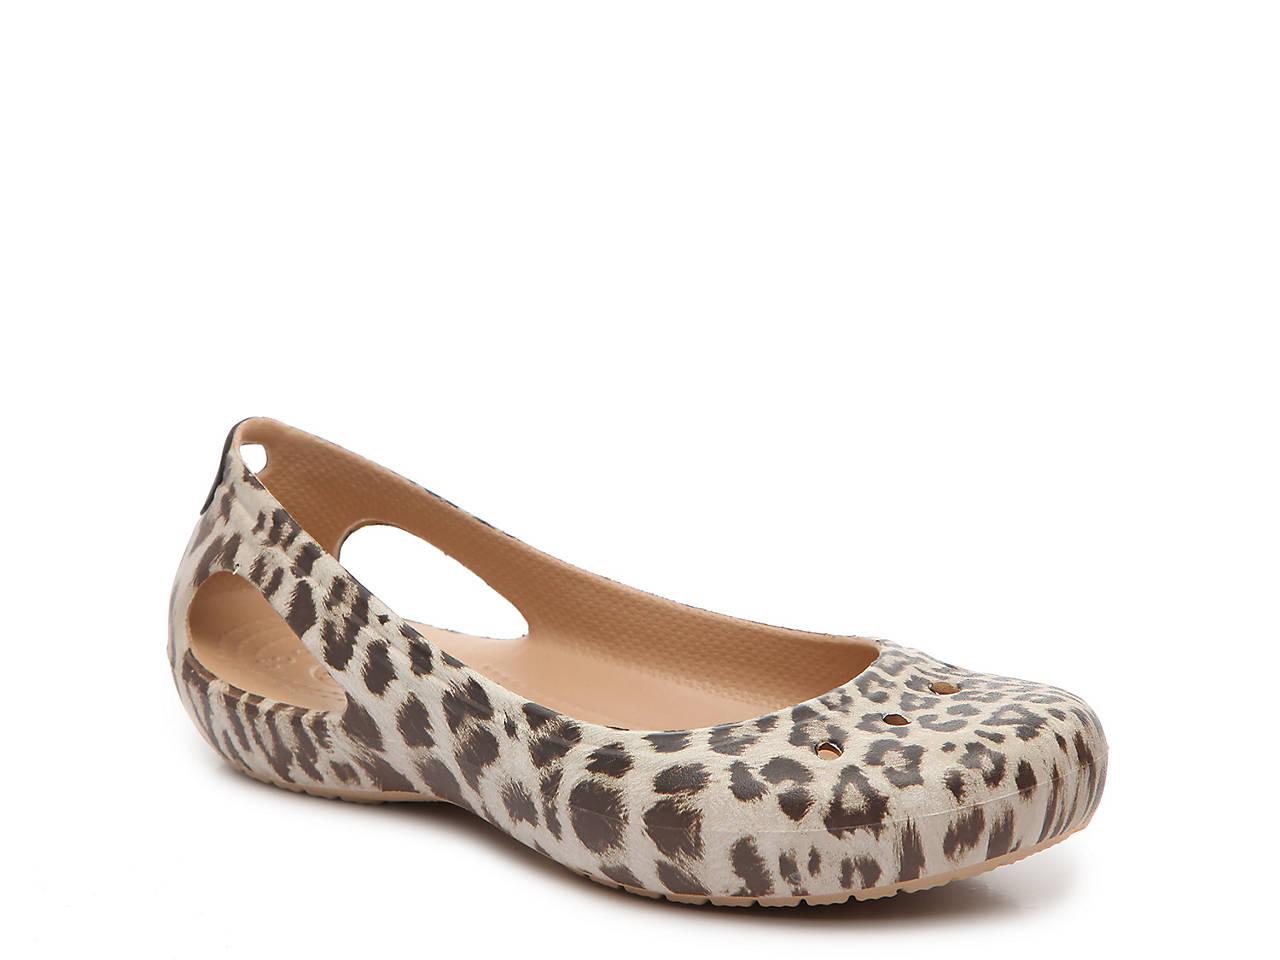 dc56c42d065ebb Crocs Kadee Graphic Flat Women s Shoes